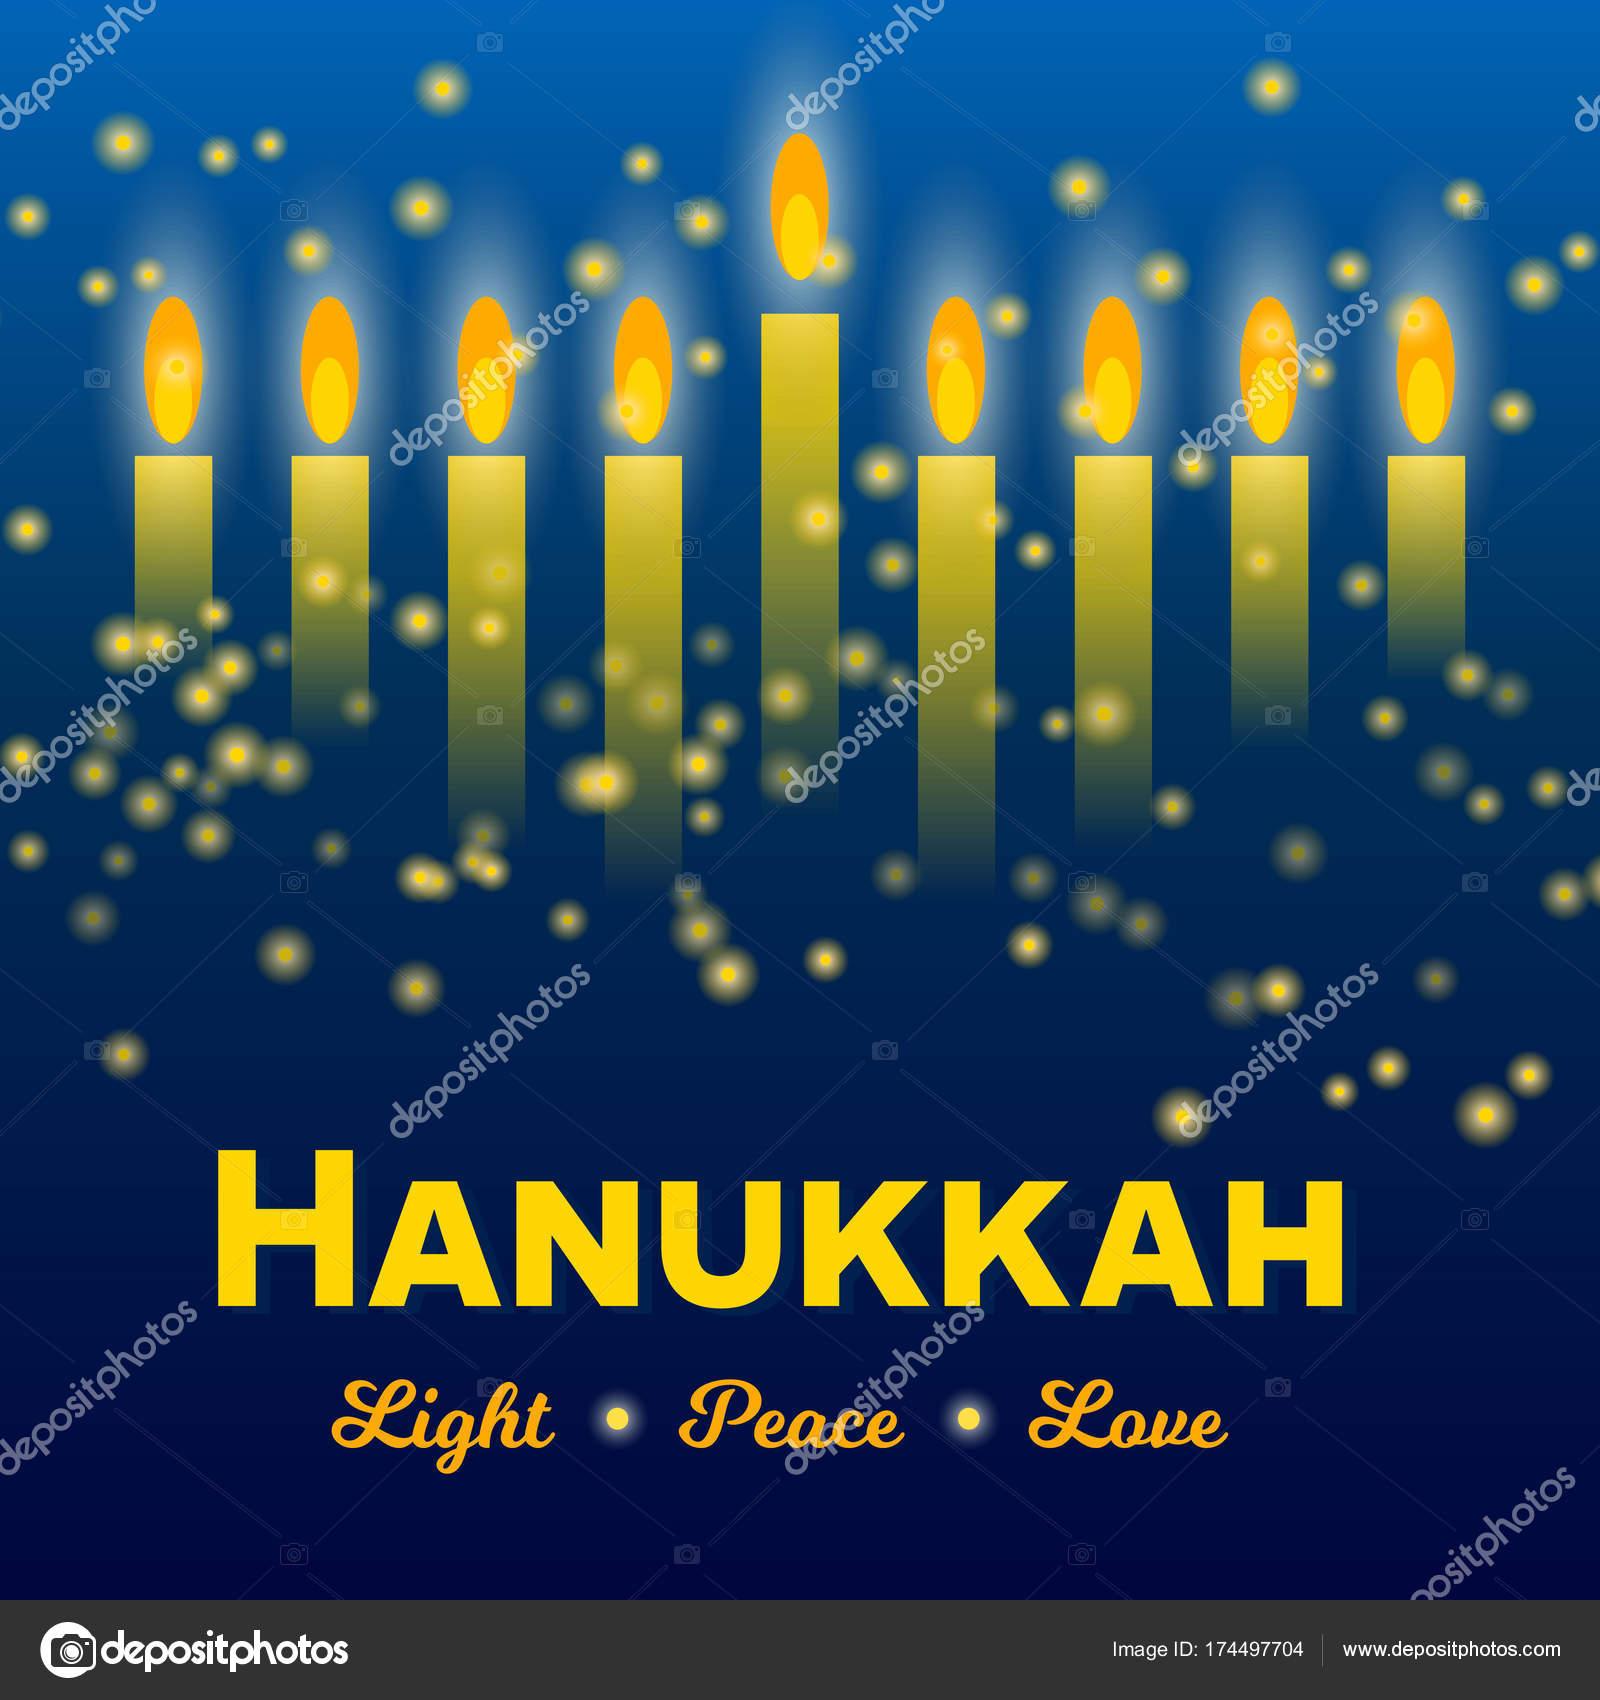 Happy hanukkah greeting card lights on dark stock vector happy hanukkah greeting card lights on dark stock vector m4hsunfo